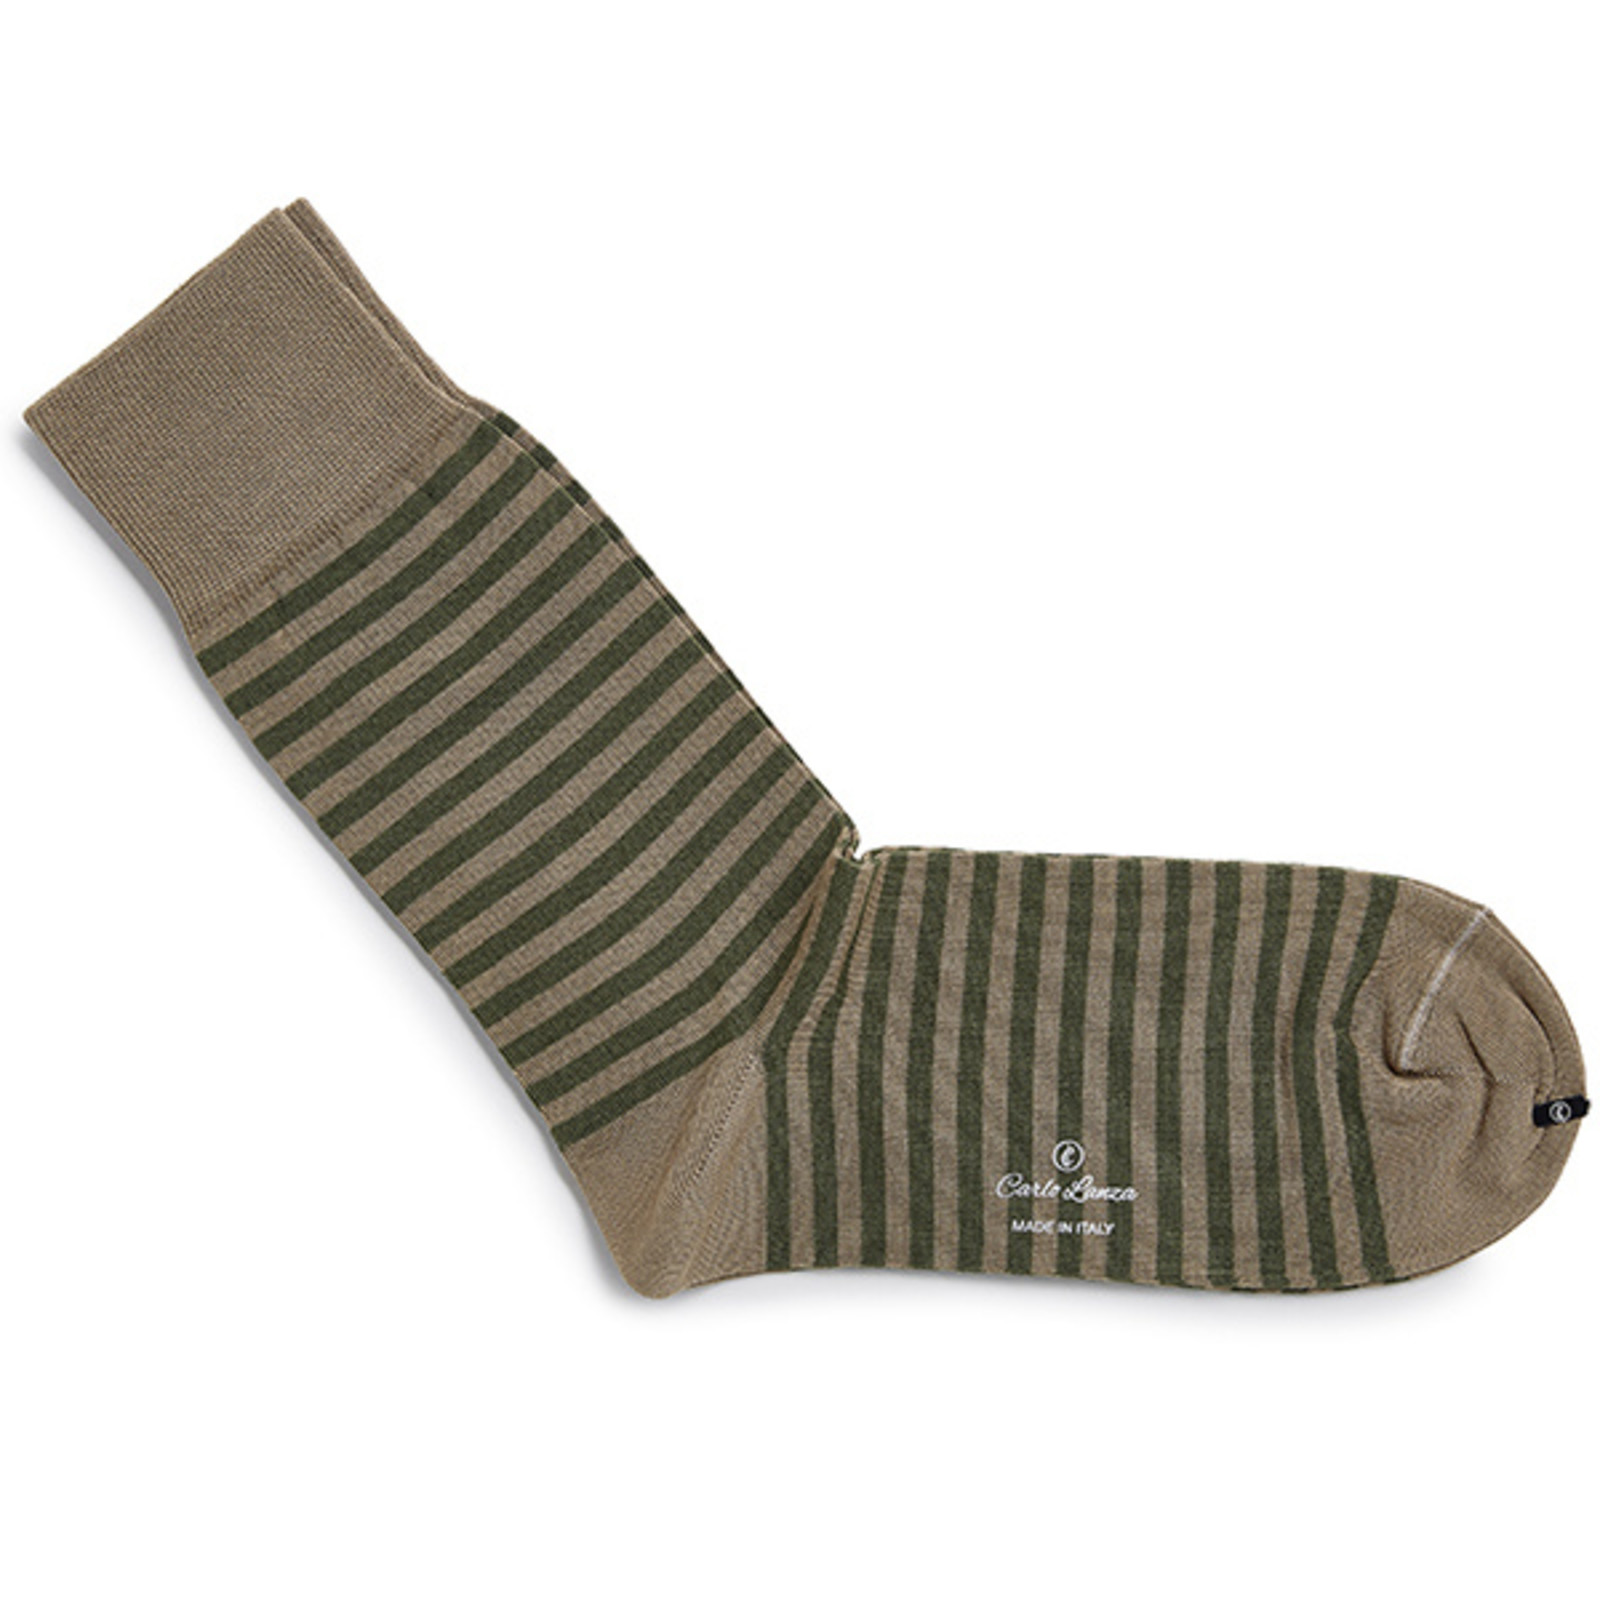 Carlo Lanza Olivgrüne gestreifte Socken